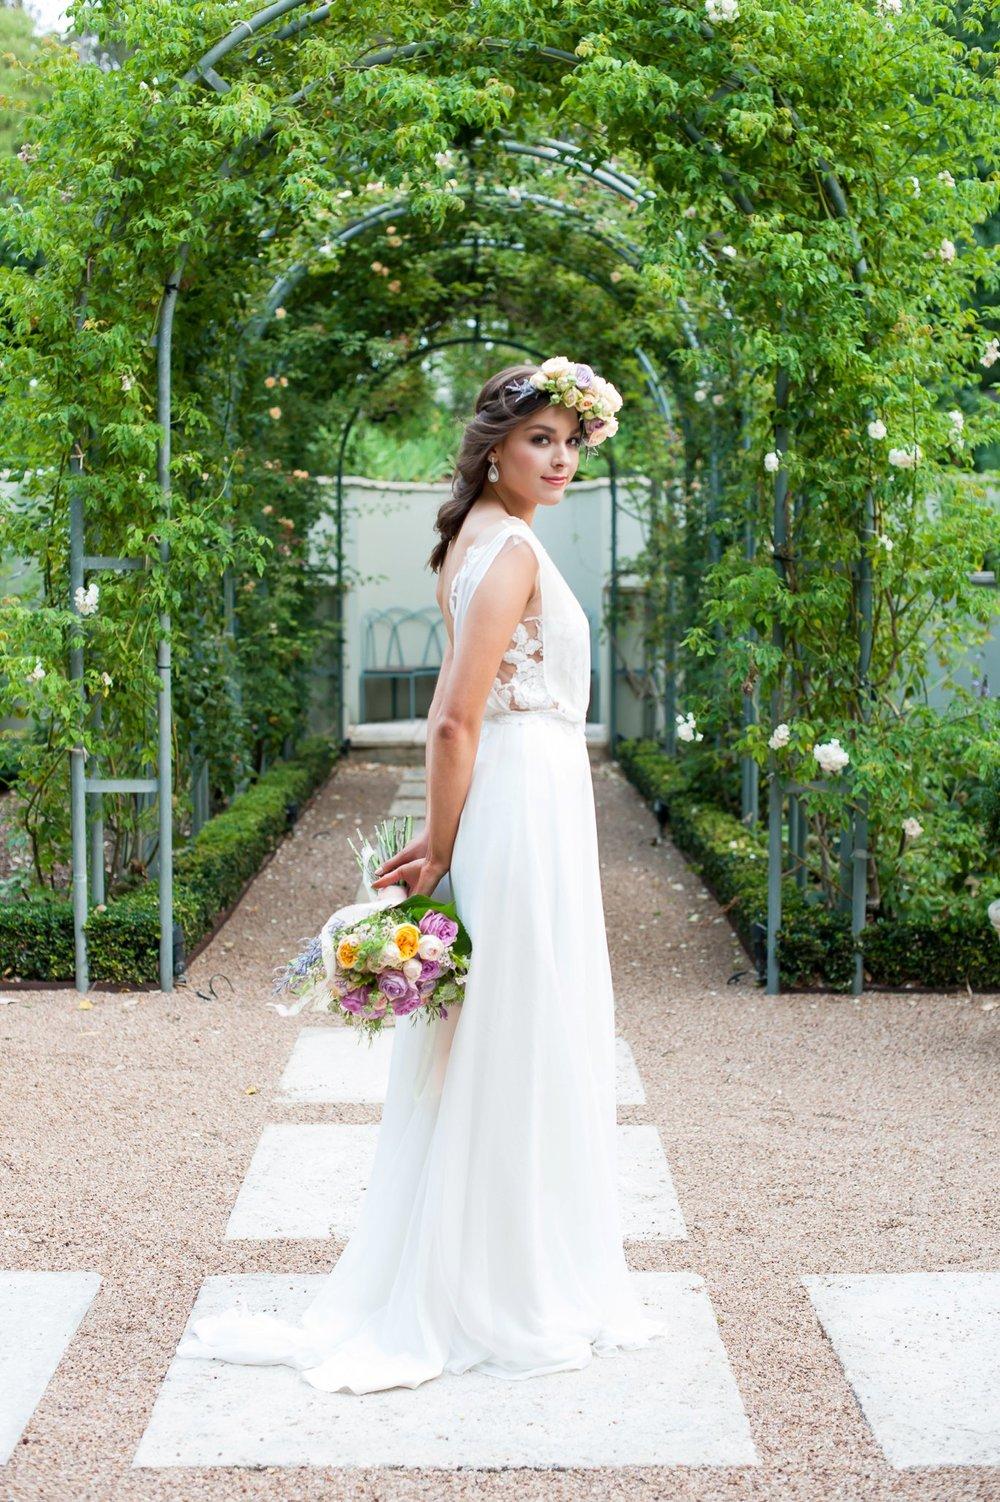 02-margaret-river-secret-garden-wedding